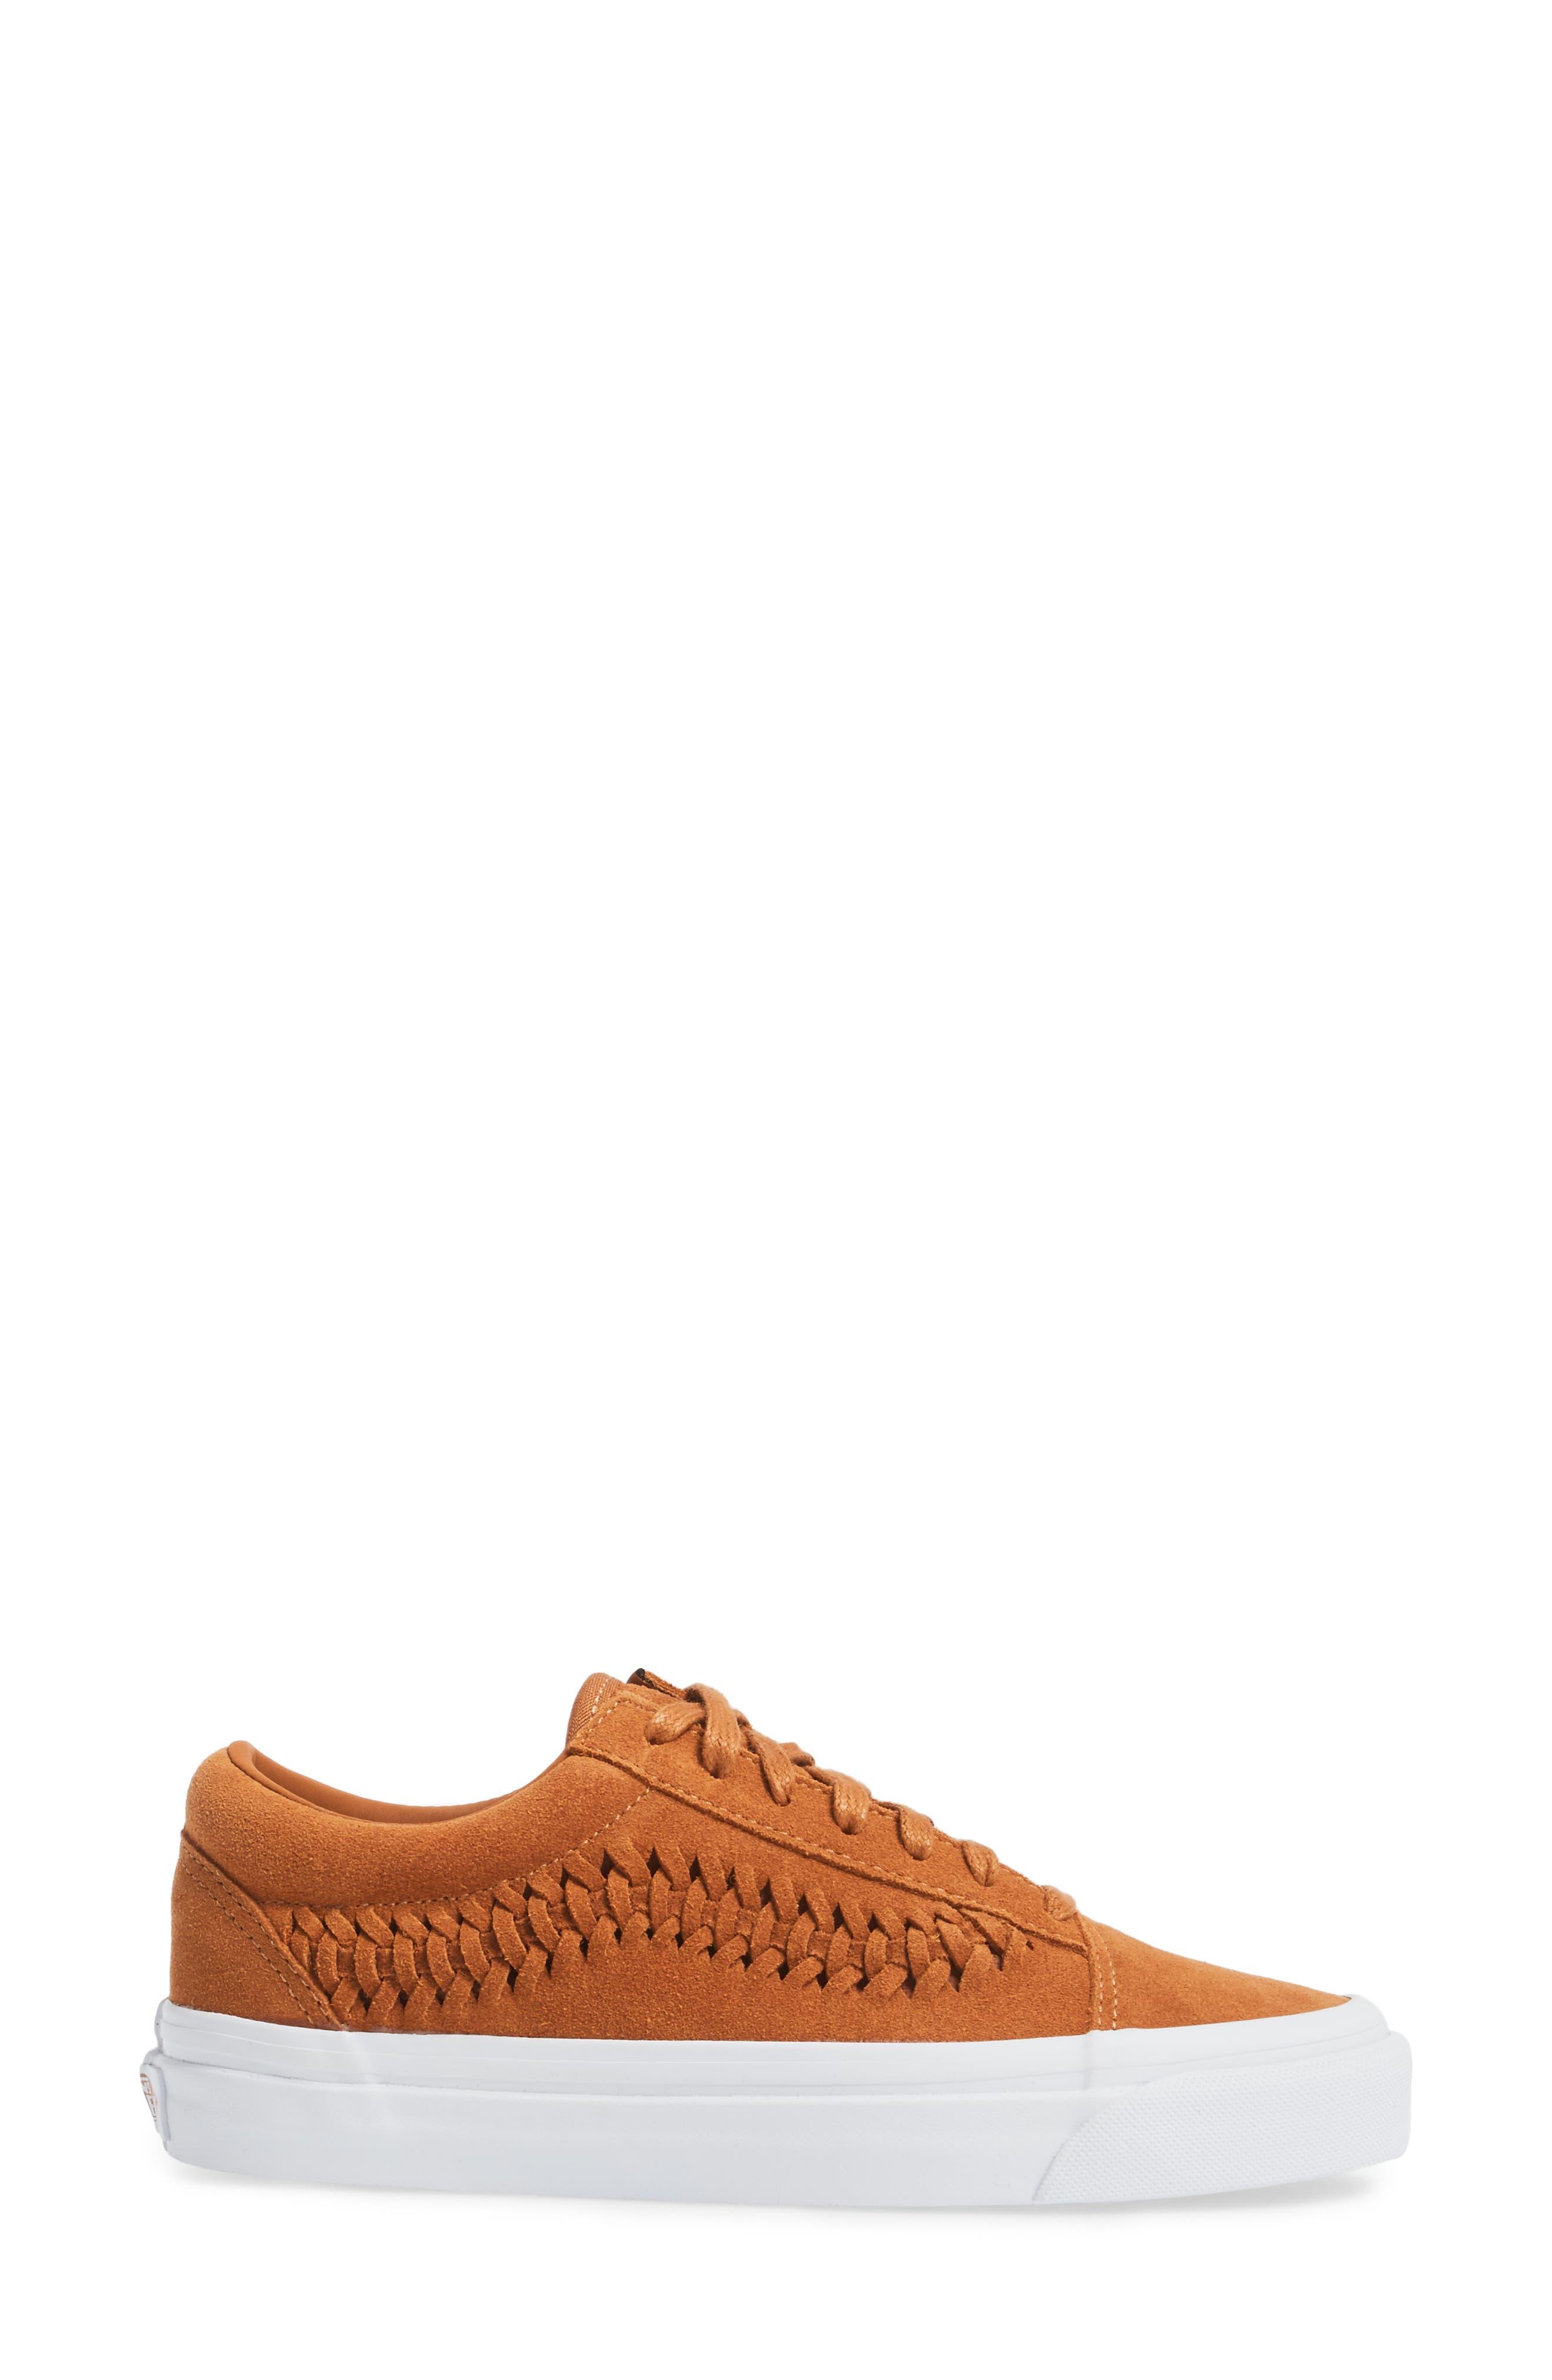 Old Skool Weave DX Sneaker,                             Alternate thumbnail 3, color,                             200